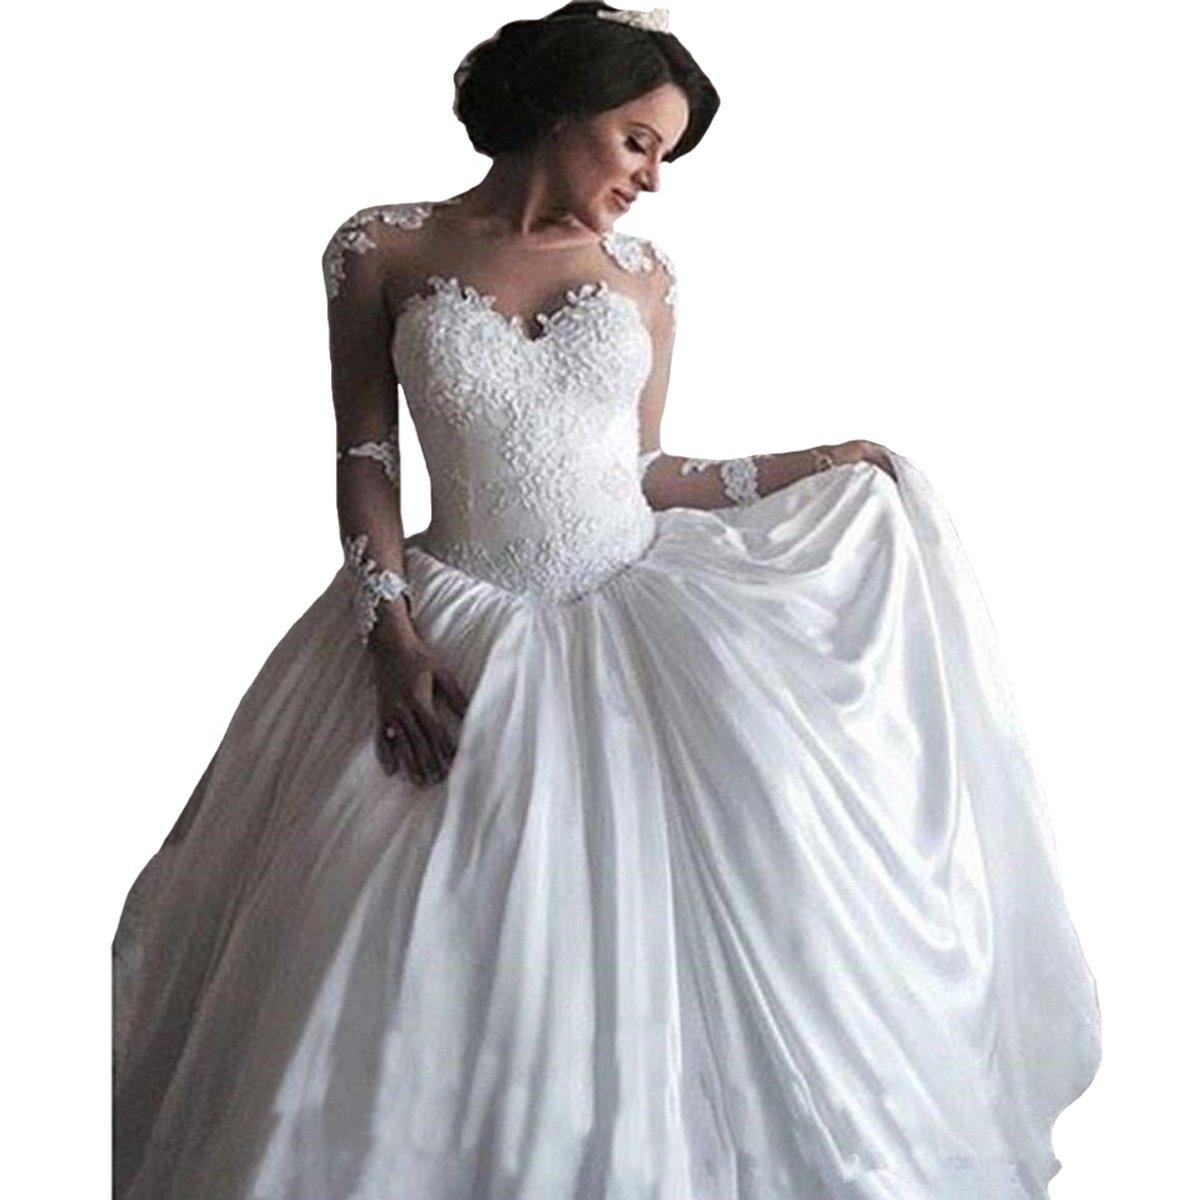 Fair Lady Princess Ball Gown Wedding Dress Backless Long Sleeves